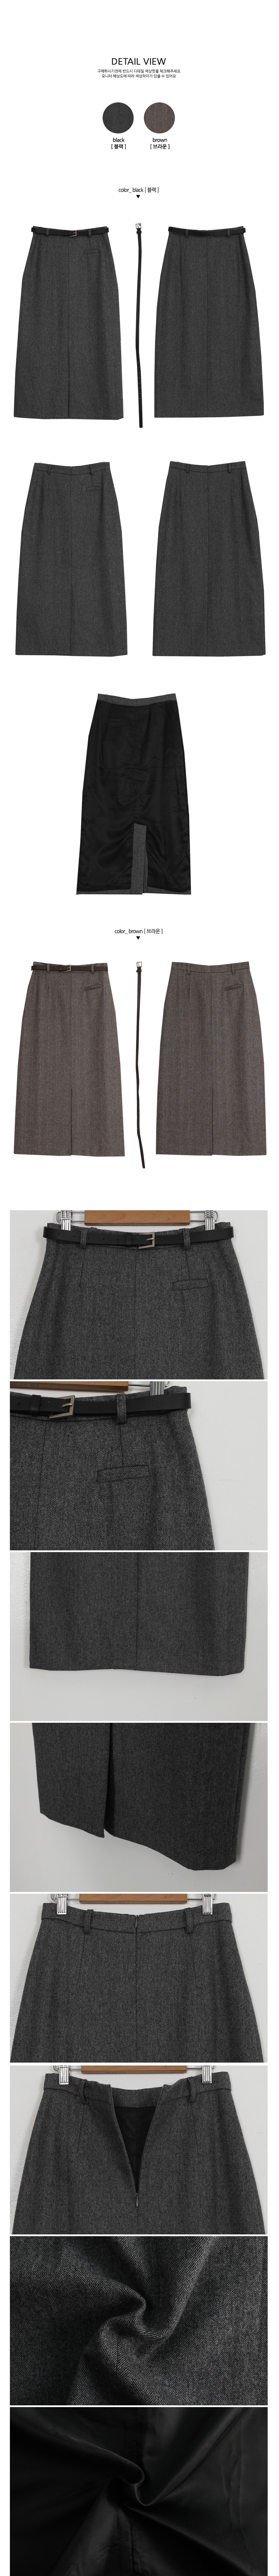 Veggie herringbone woolen skirt